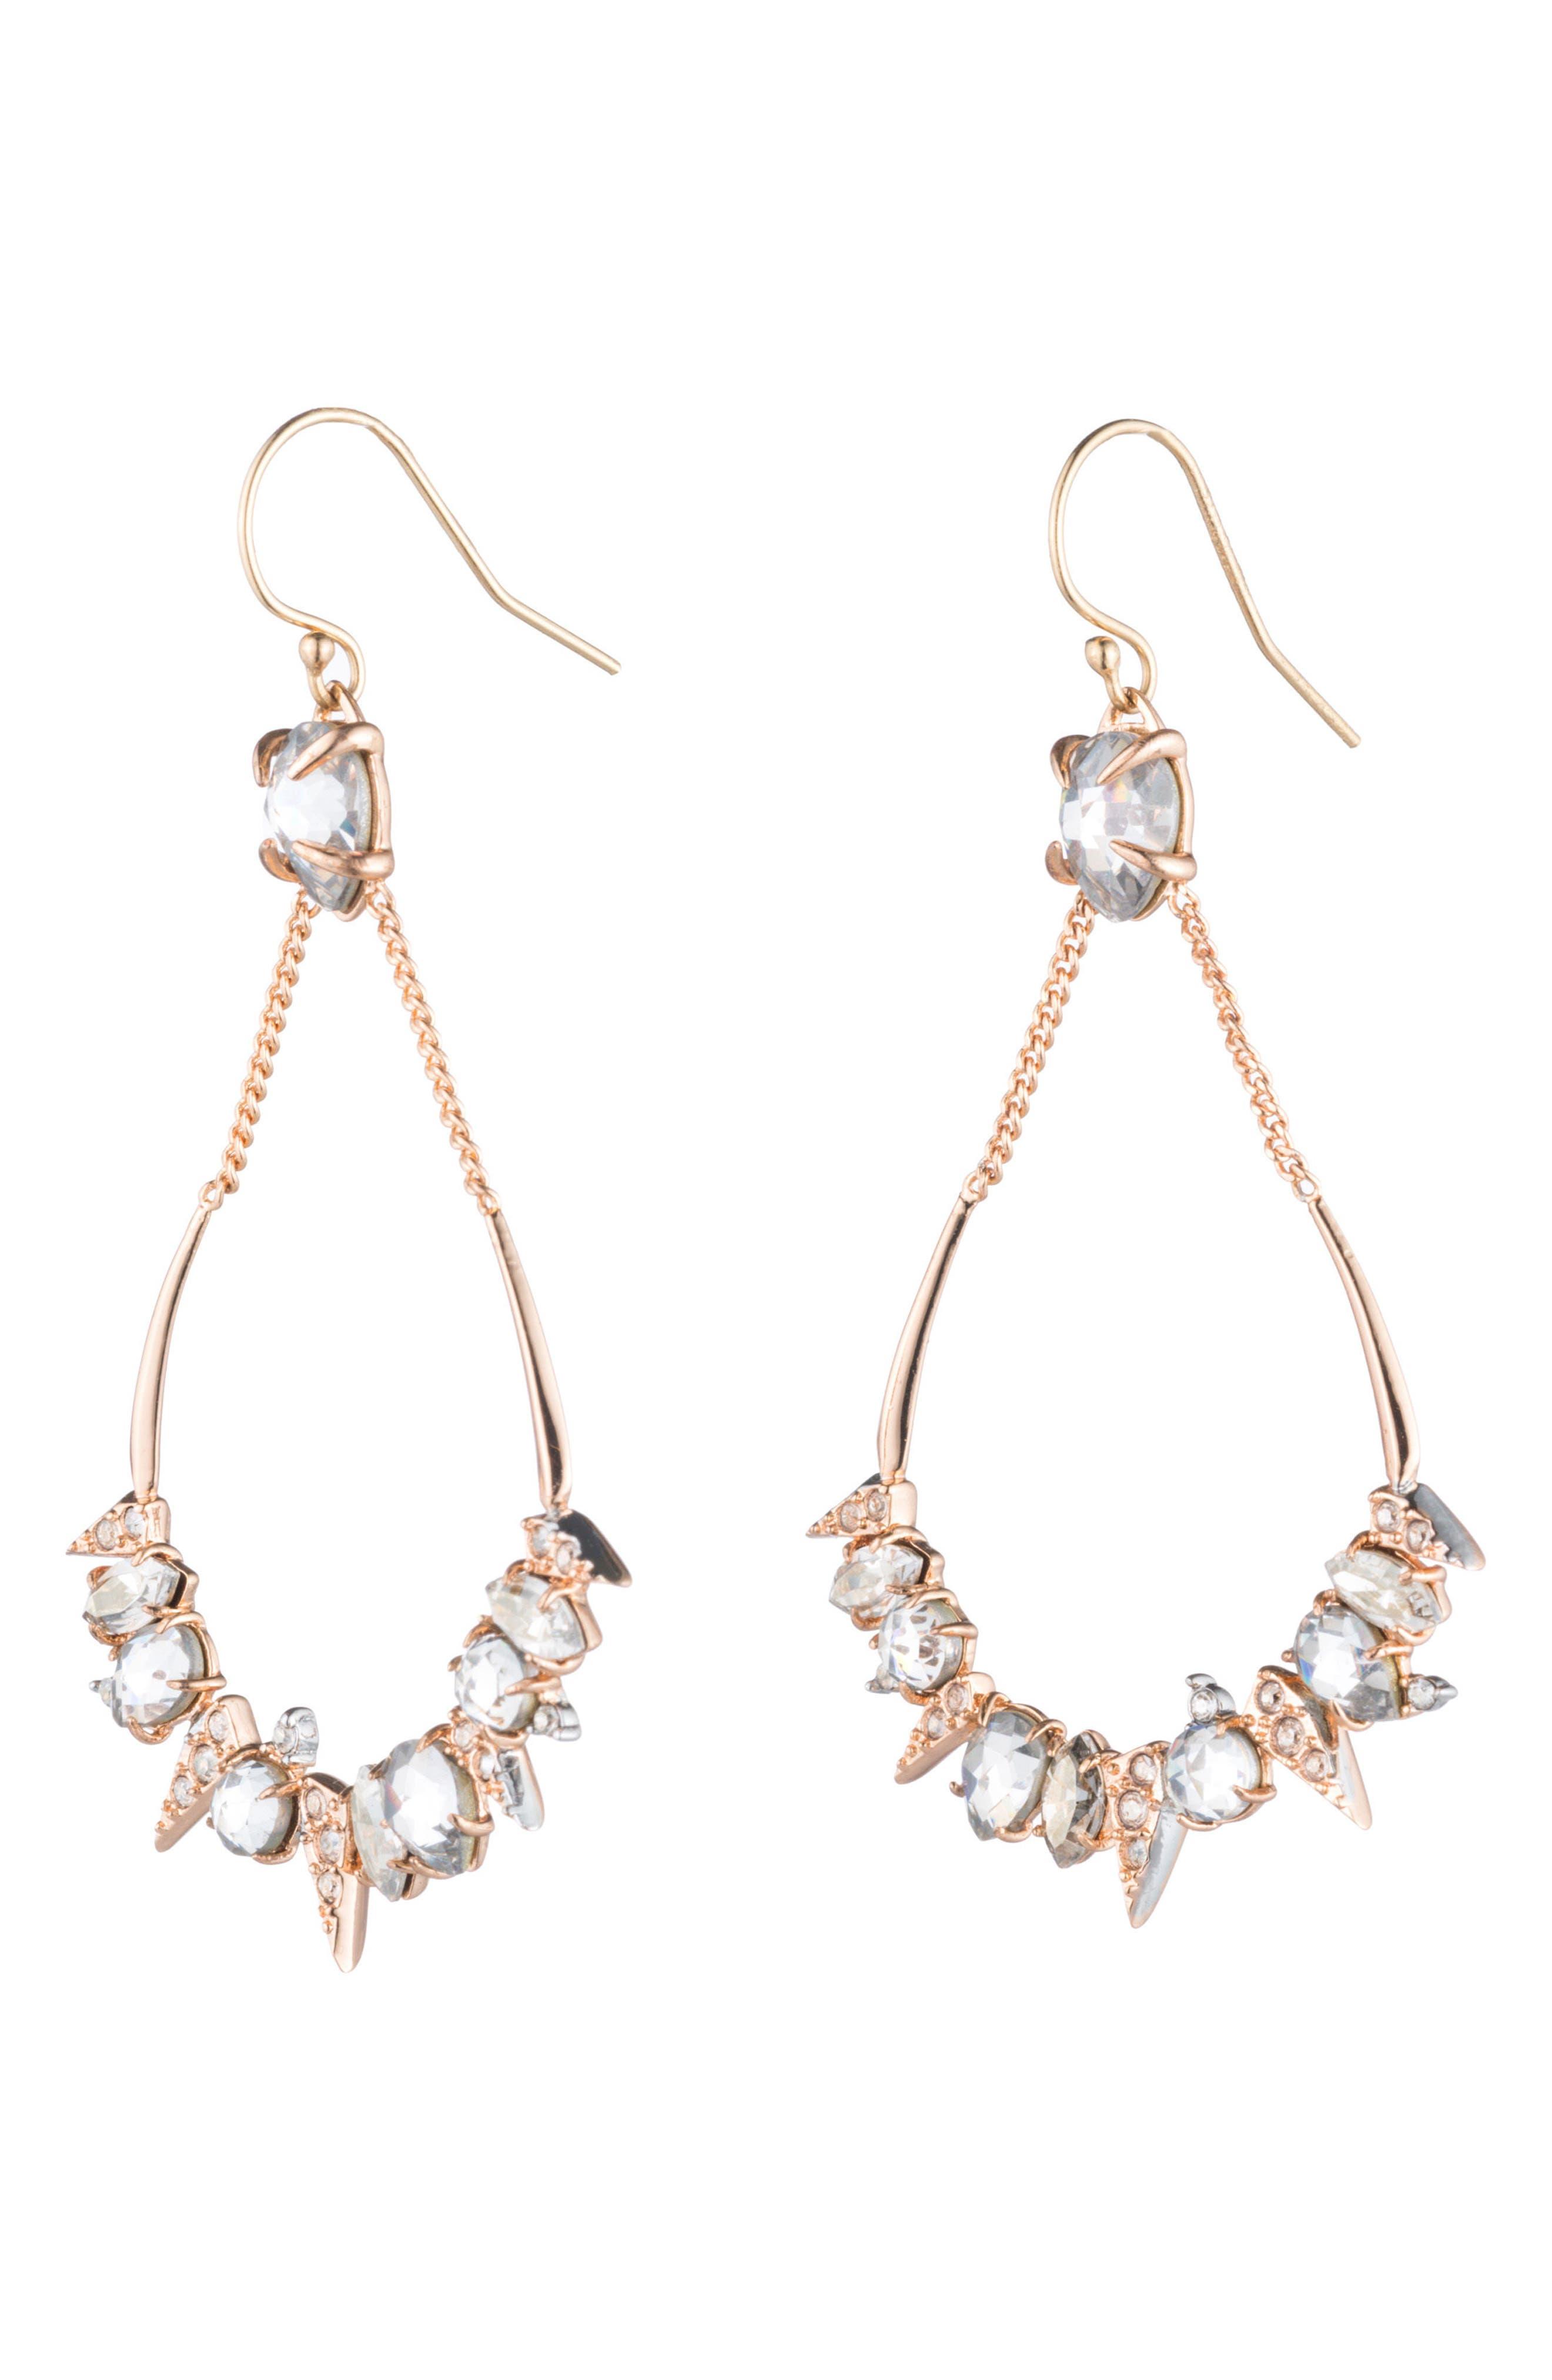 Crystal Encrusted Mosaic Drop Earrings,                             Main thumbnail 1, color,                             Rose Gold